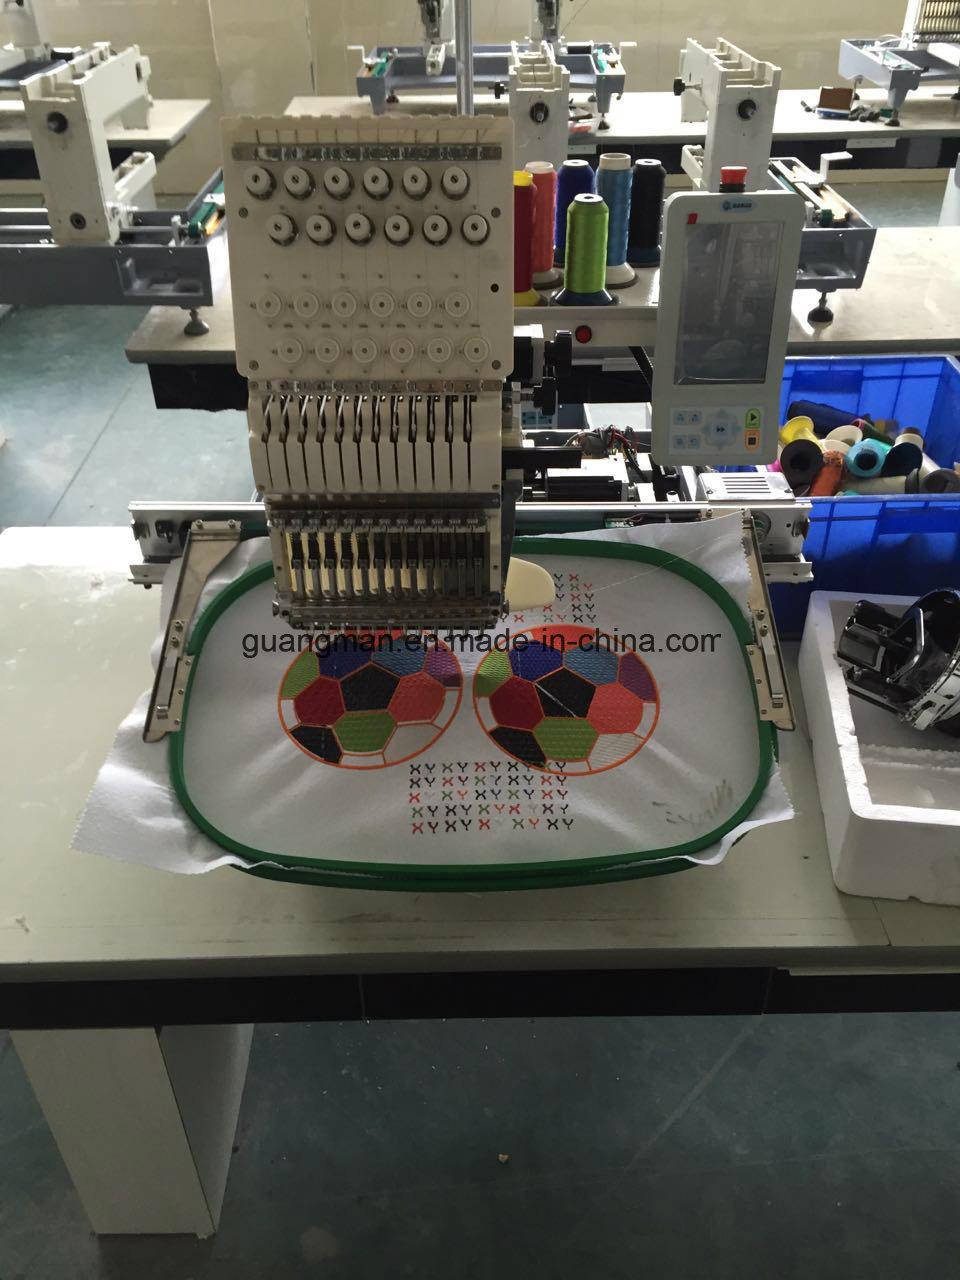 Hye-T1501/400*400 Cap T-Shirts Embroidery Machine